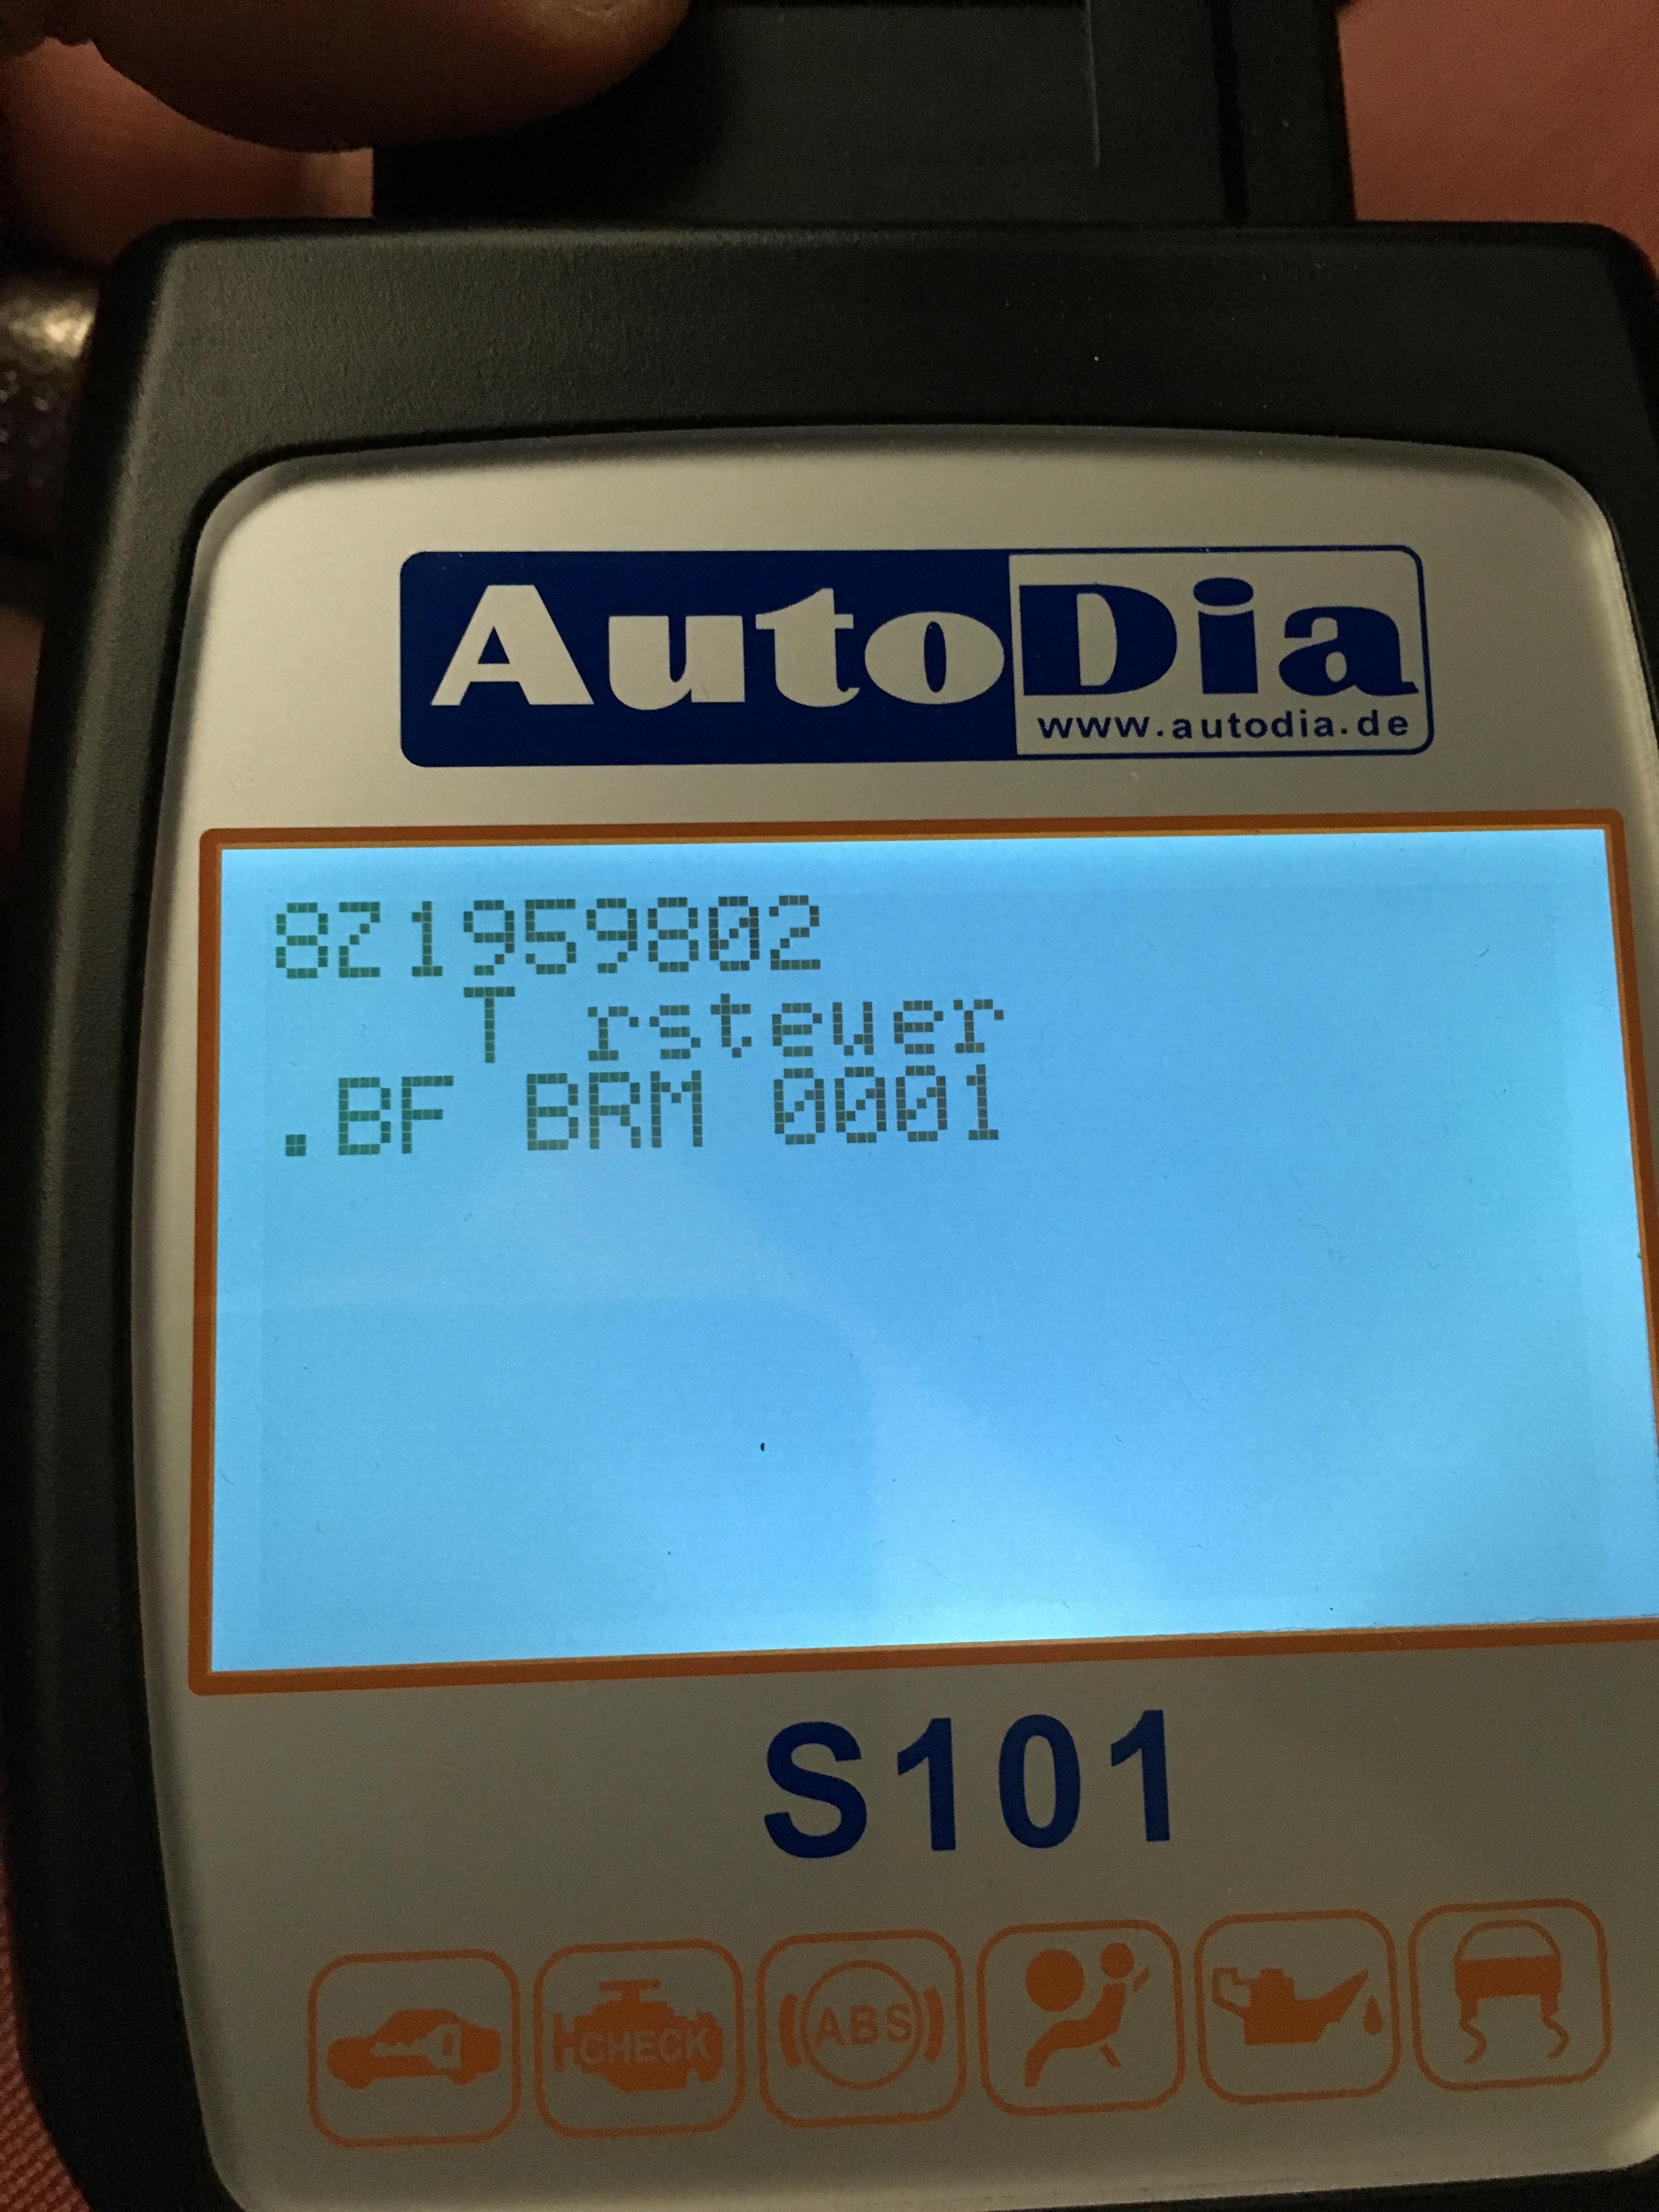 58934469b5f7e_Autodiag-1.jpg.633dde5cf81f0facfdcc04dbdc382b7a.jpg